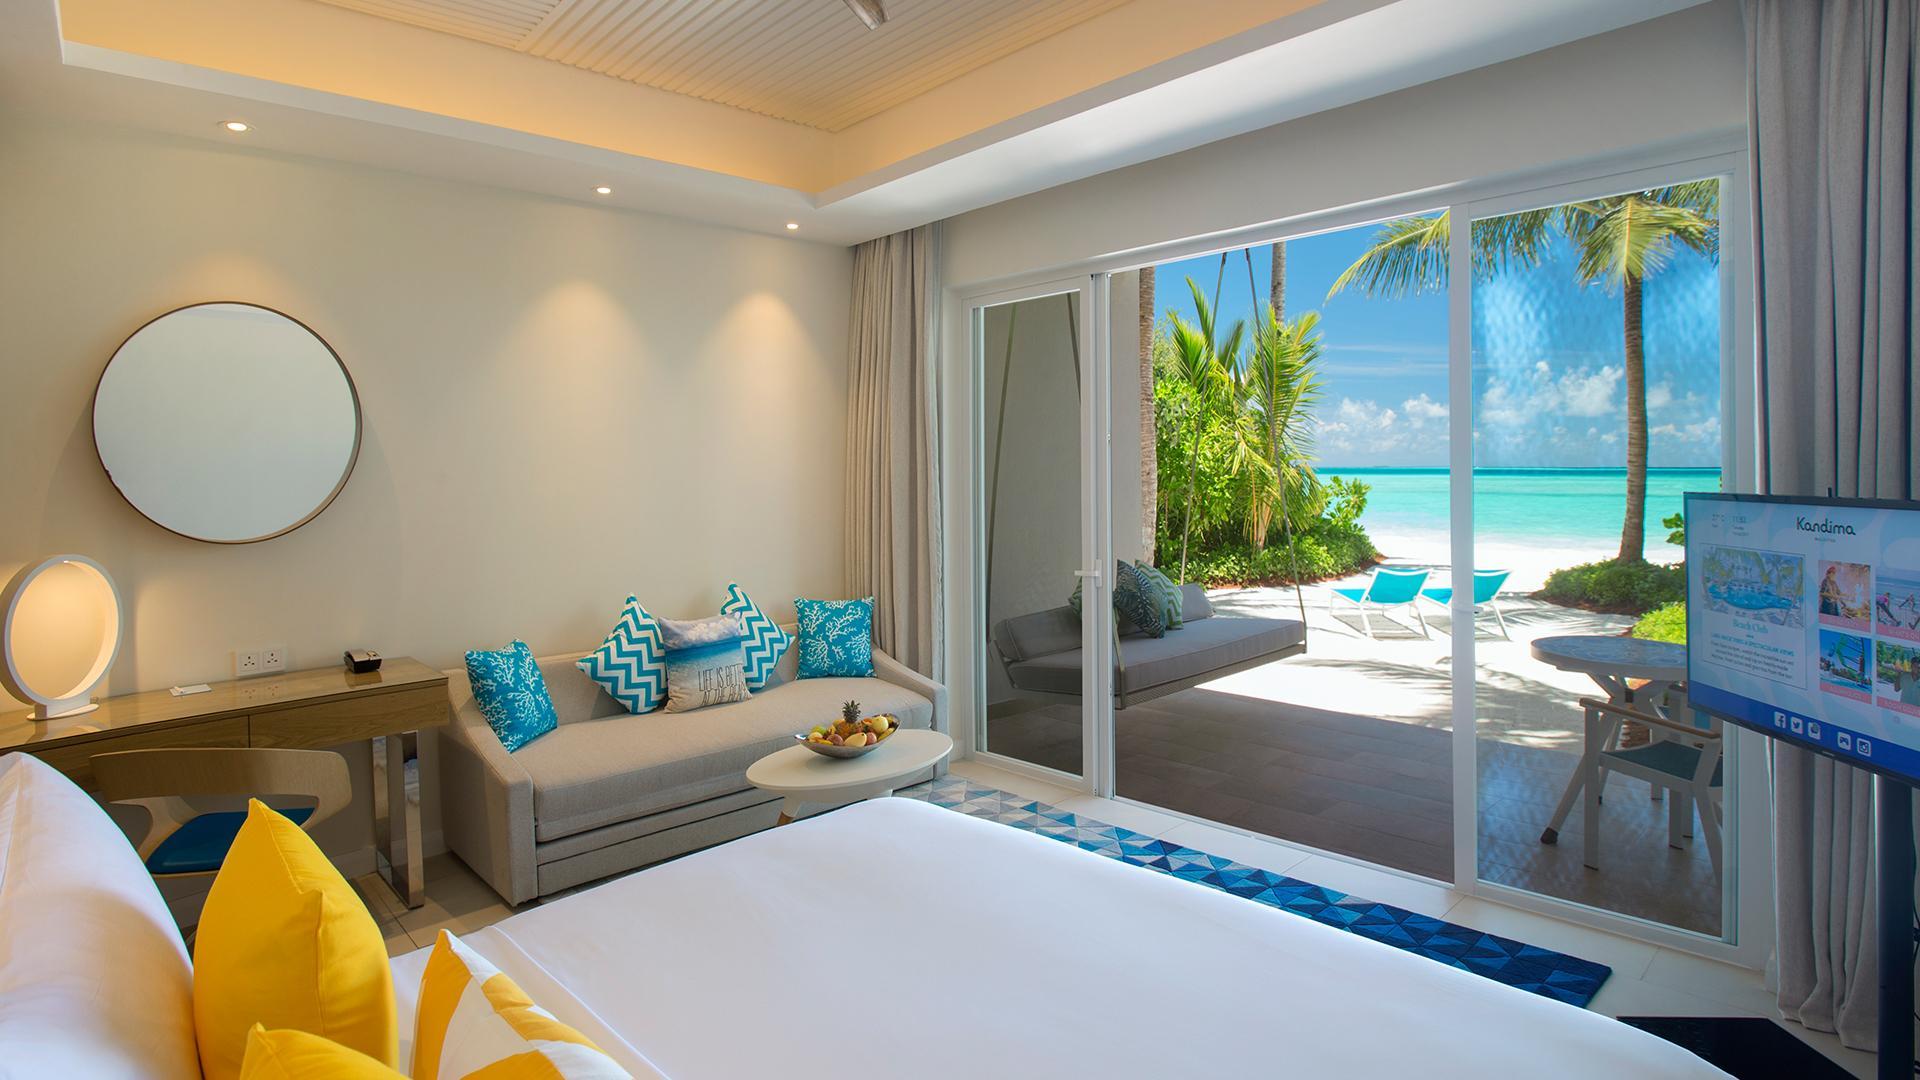 Beach Studio image 1 at Kandima Maldives by null, Central Province, Maldives